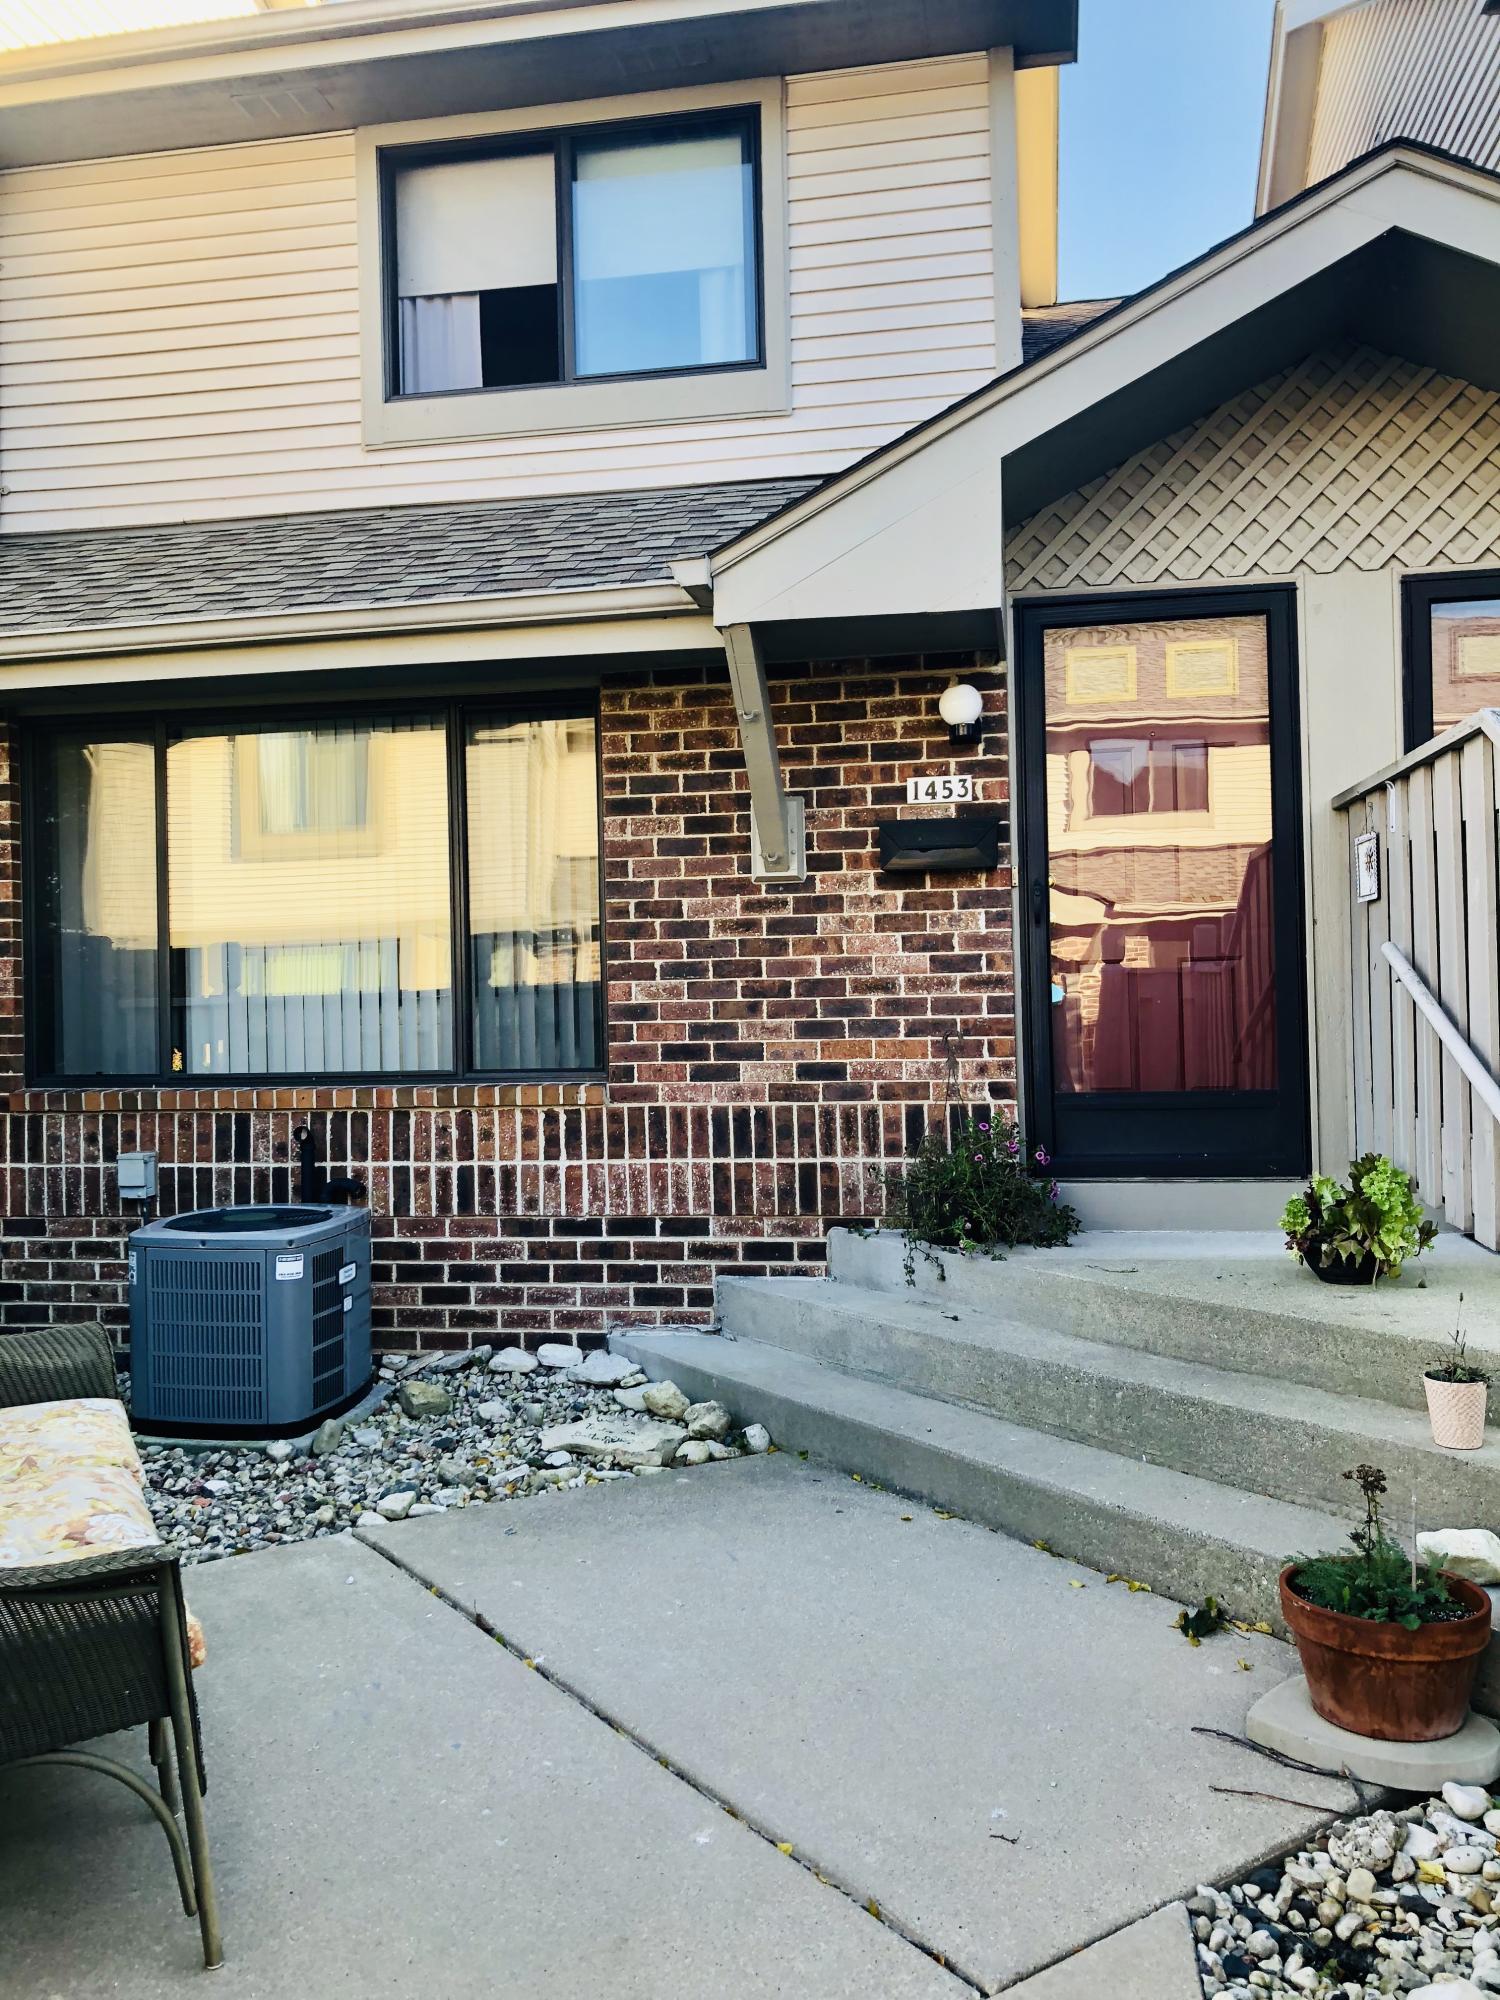 1453 28th Ct, Kenosha, WI 53140 - SOLD LISTING, MLS # 1611033 | Keefe Real  Estate